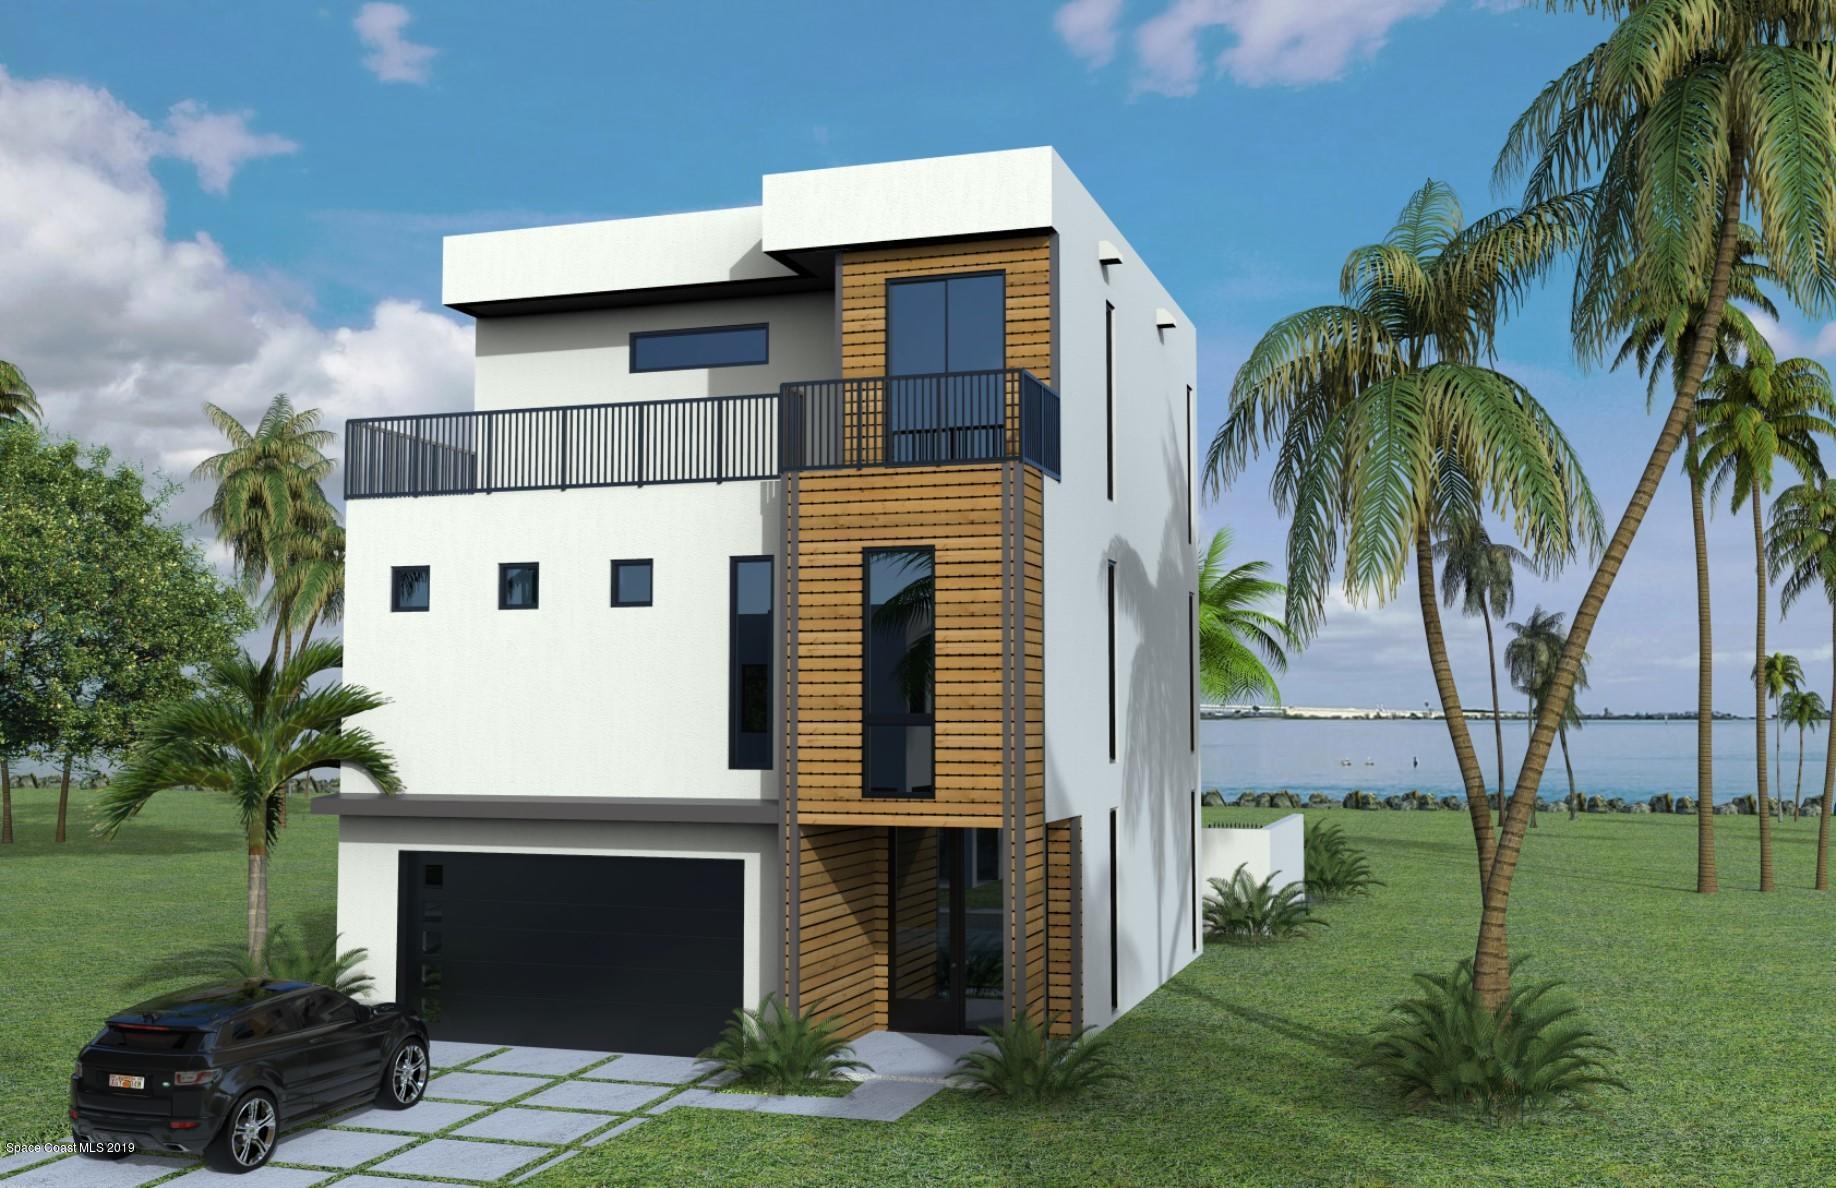 Single Family Homes για την Πώληση στο 1 Ocean River Cocoa Beach, Φλοριντα 32931 Ηνωμένες Πολιτείες